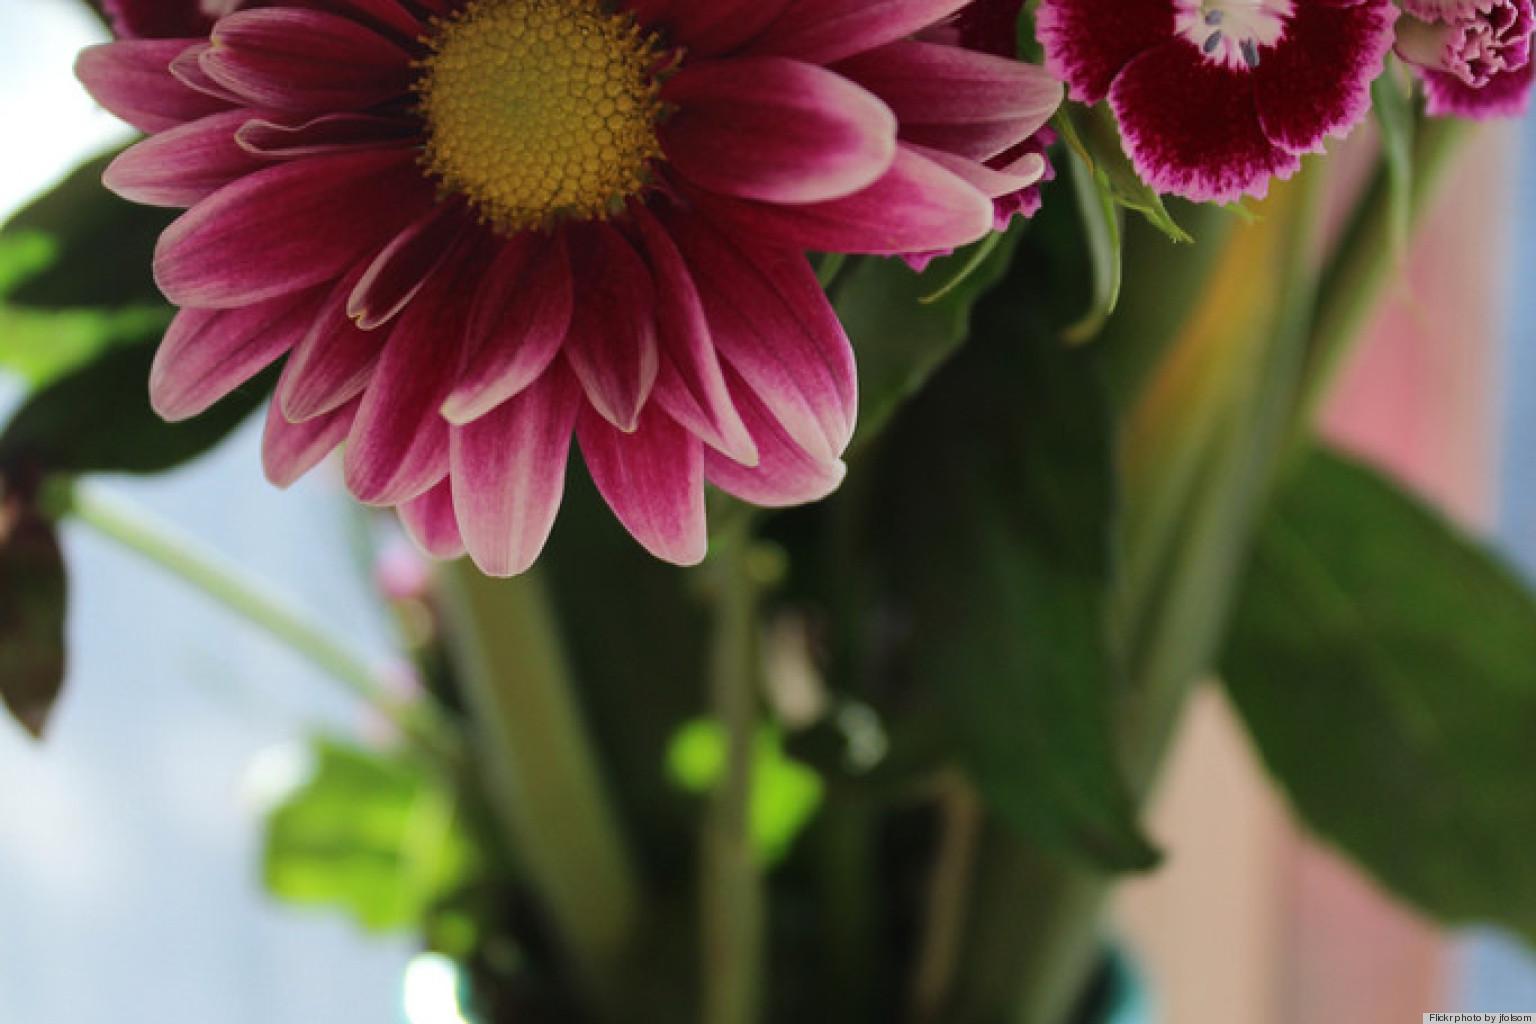 Wedding Flowers How To Keep Fresh : How to keep flowers fresh longer using up huffpost